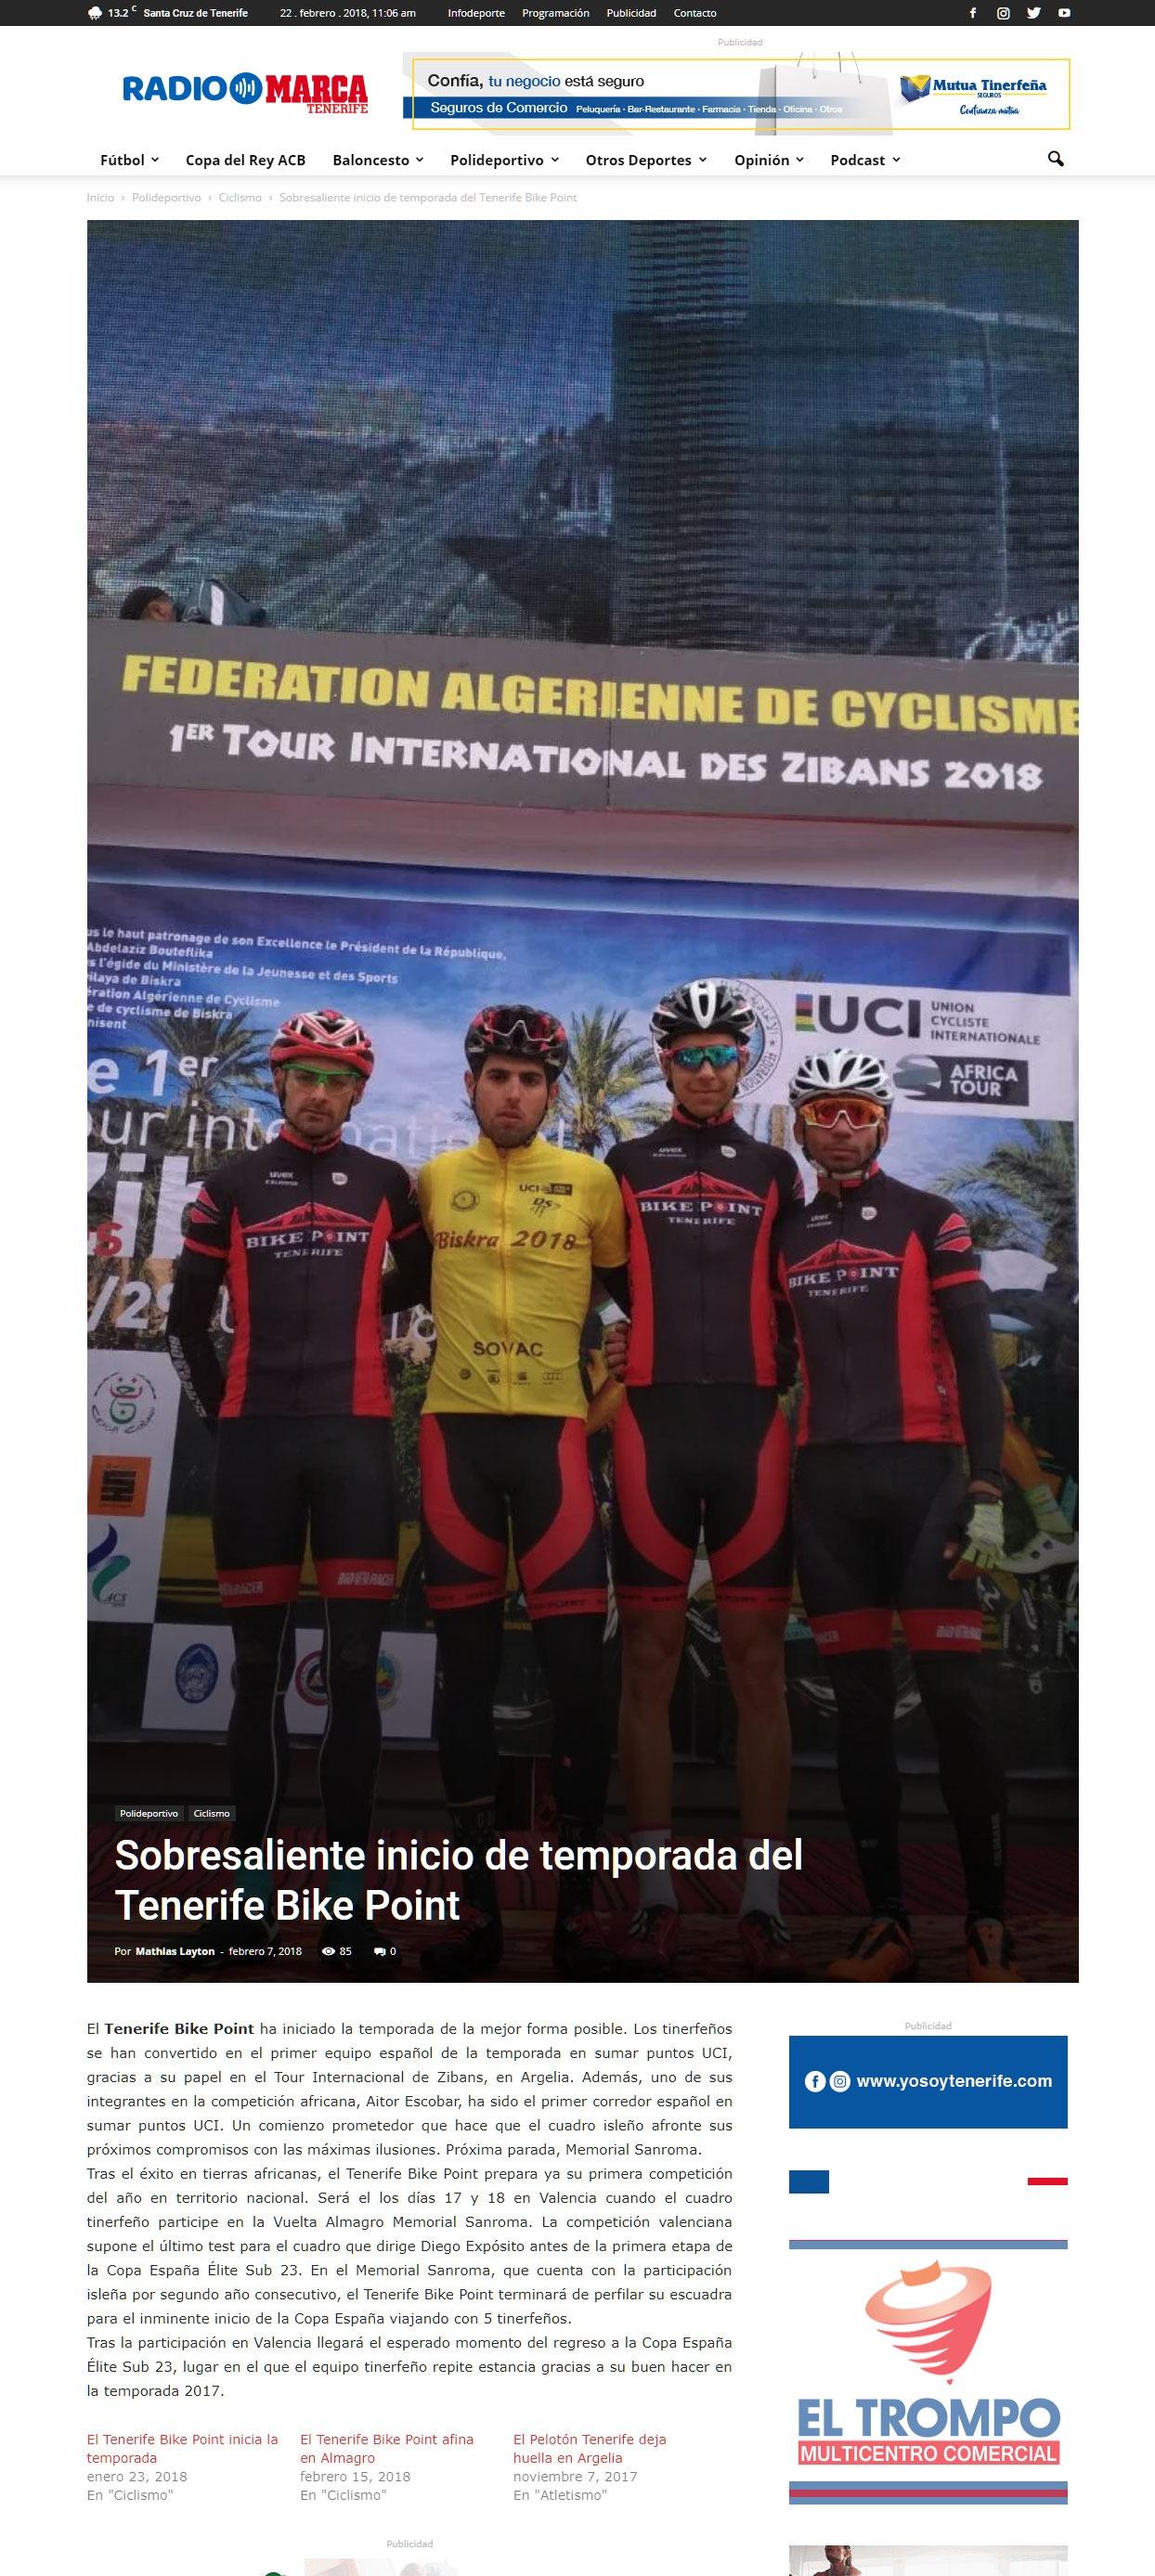 Radio Marca Tenerife -Sobresaliente inicio de temporada del Tenerife Bike Point